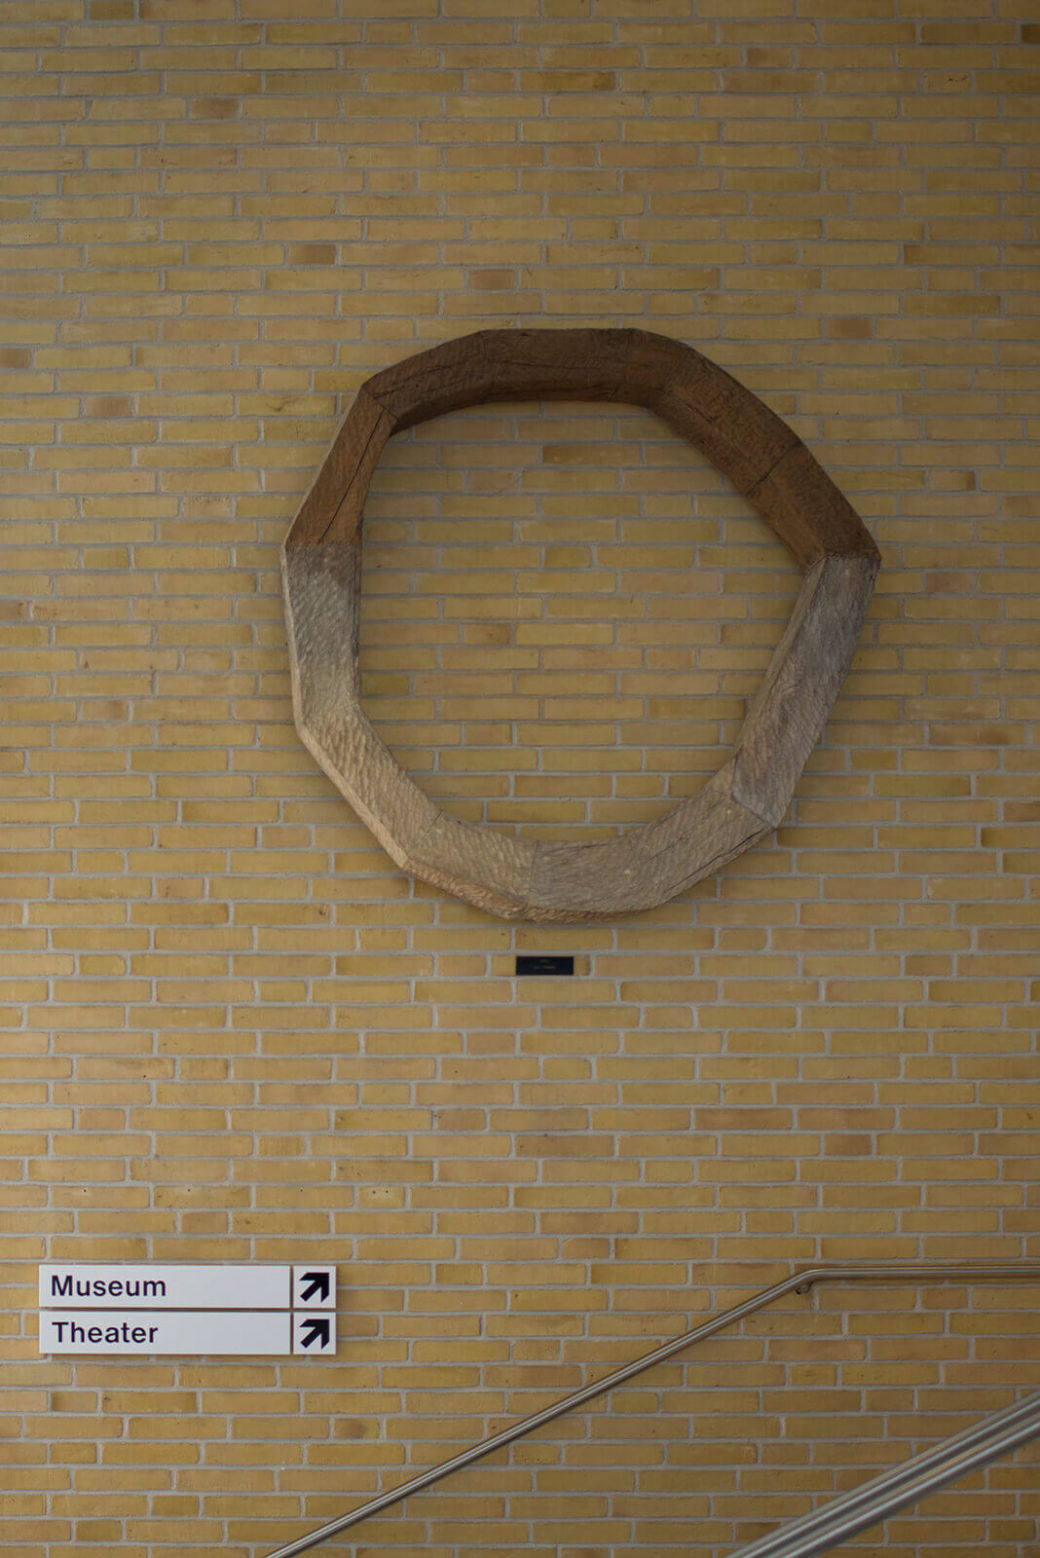 Ulrich Lindow: Kreis aus Mooreiche, (Foto: KUNST@SH/Jan Petersen, 2017)